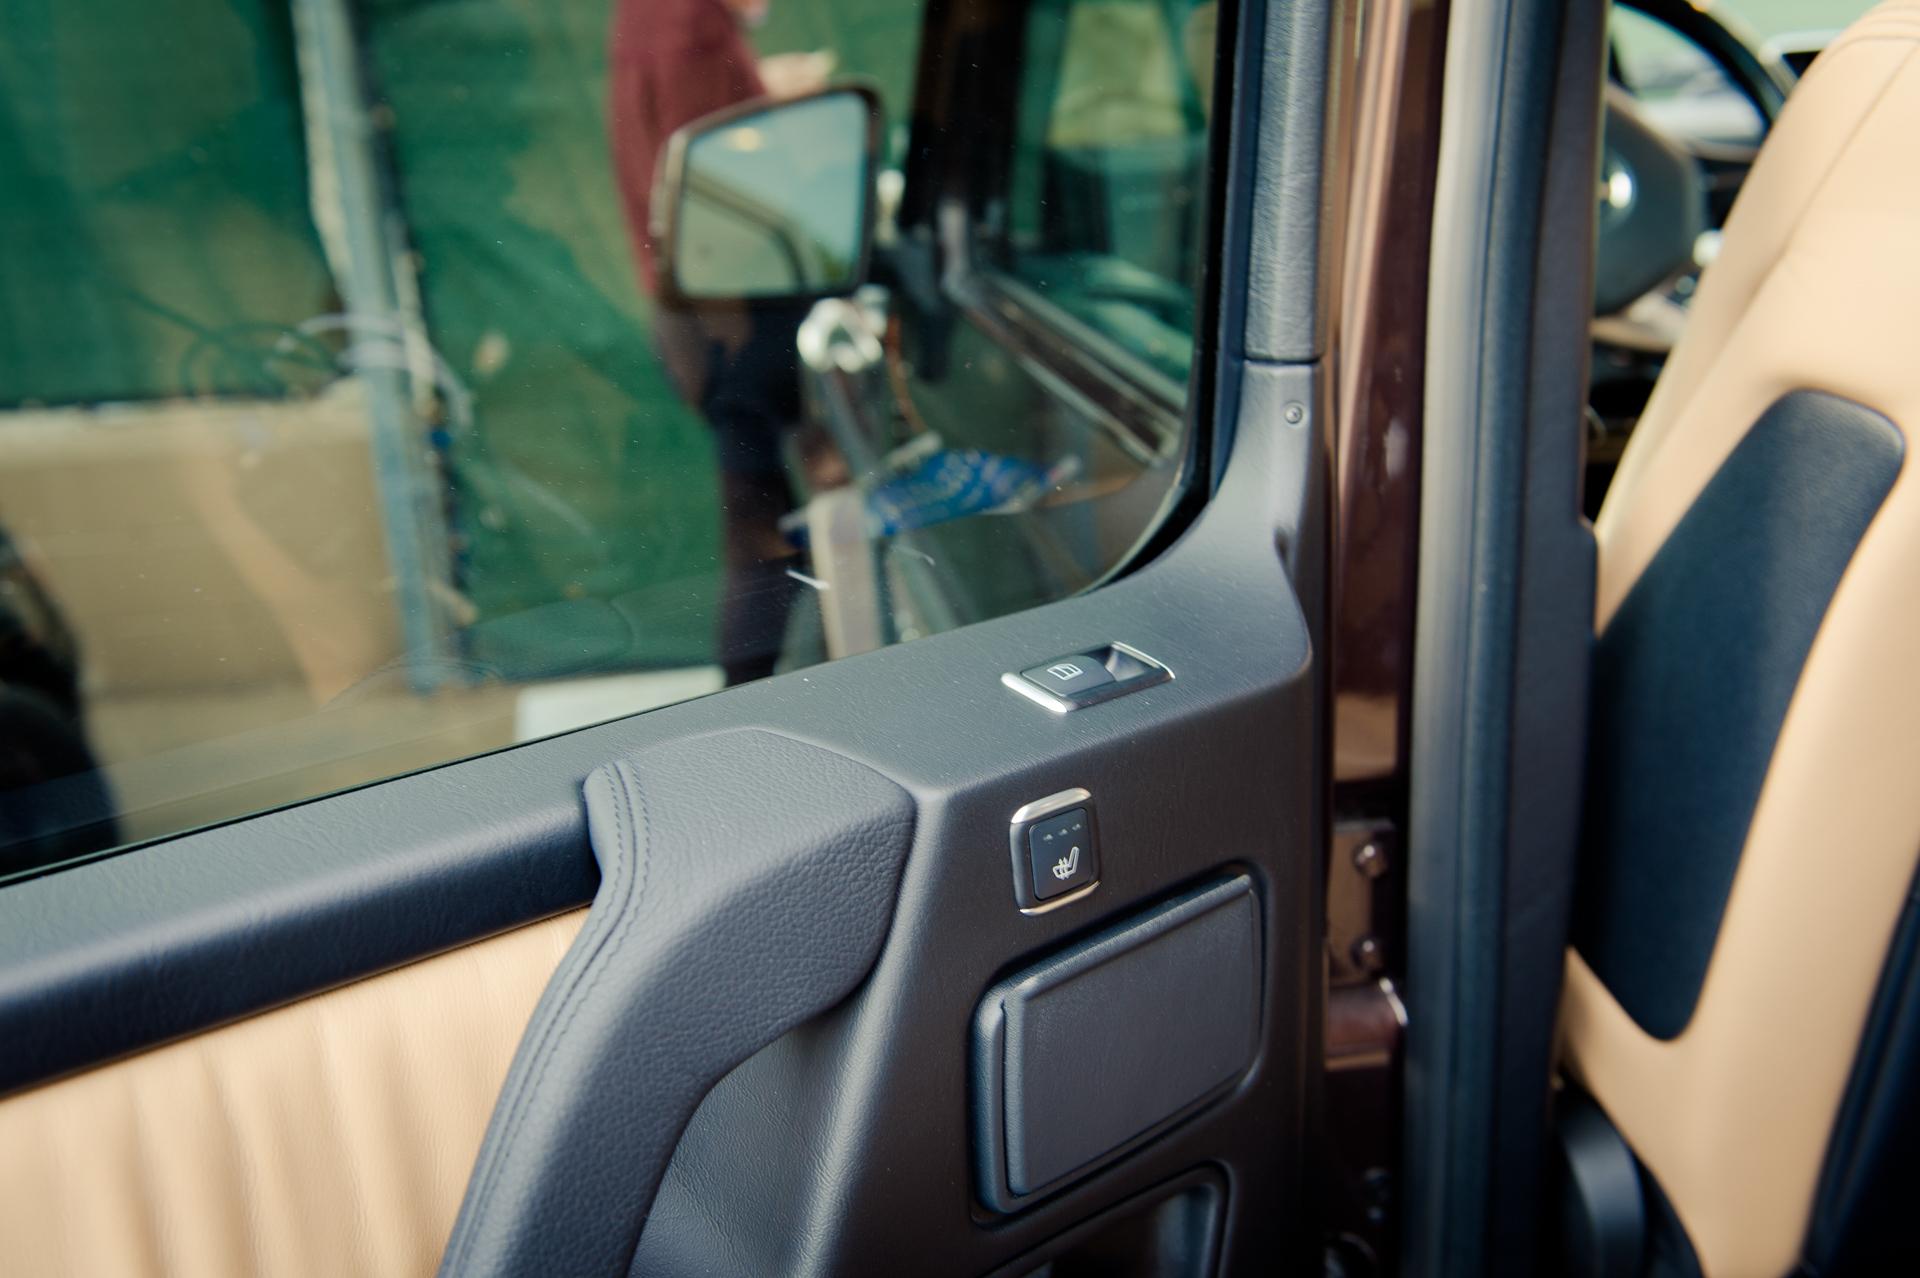 2014-Mercedes-Benz-G500-G550-braun-Kalifornien-mbrt14-36